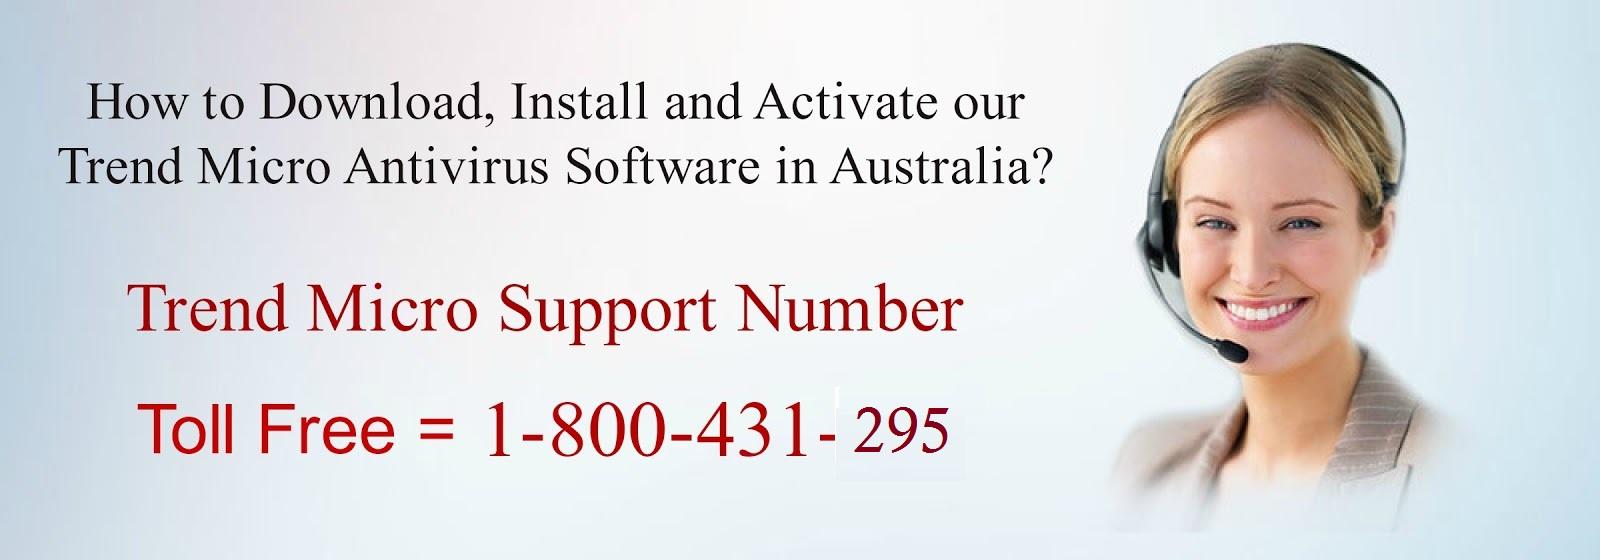 Enjoy Safe Digital Computing Using Trend Micro Antivirus Software